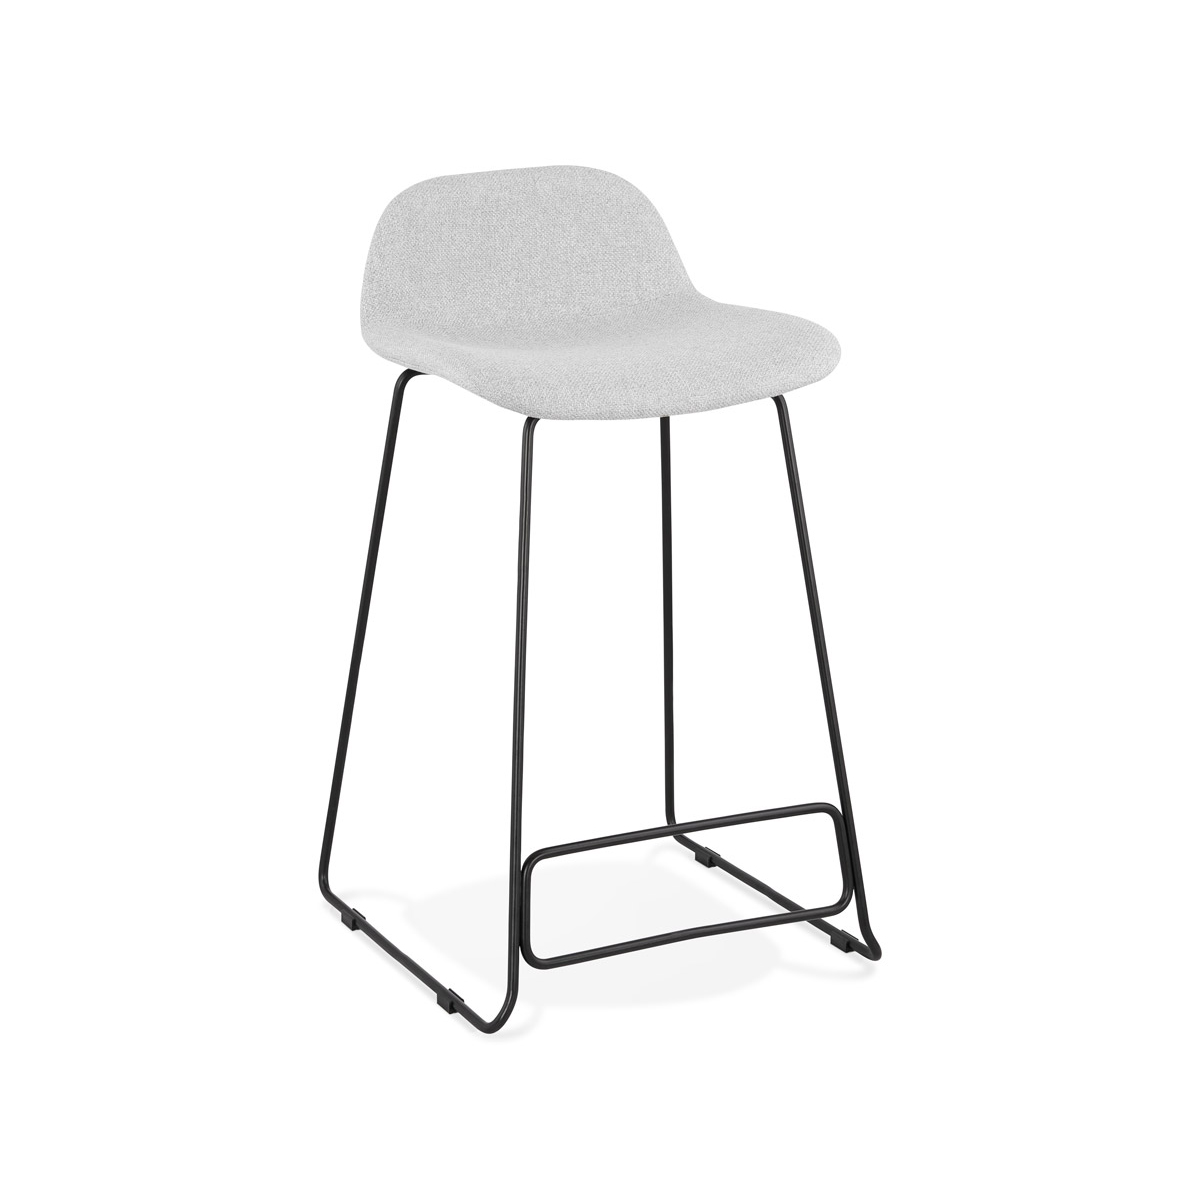 Hoker Kokoon Design Vancouver Mini jasnoszary nogi czarne